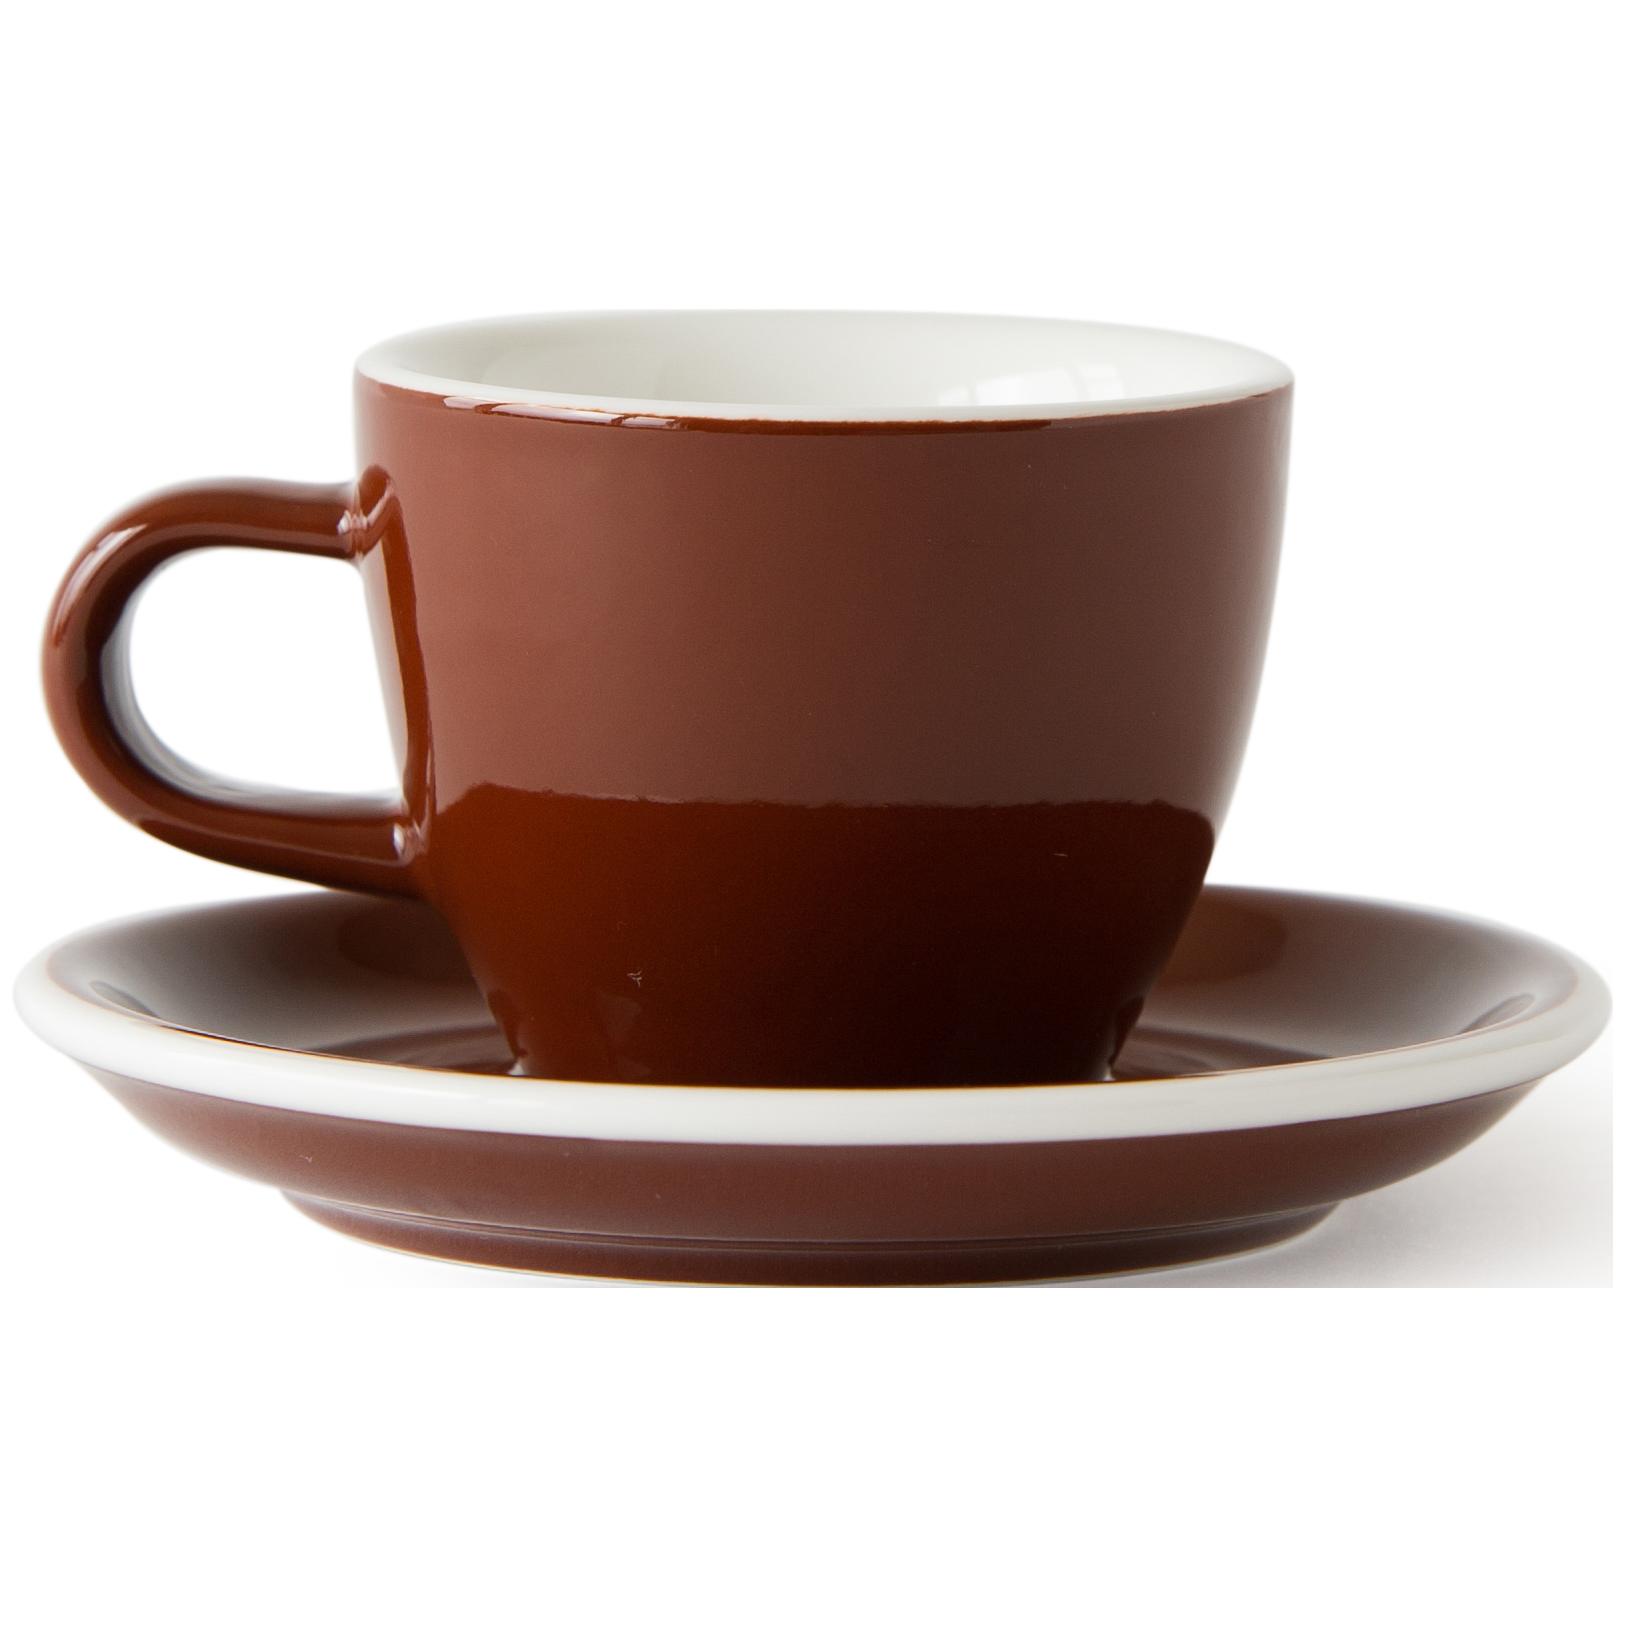 Acme Espresso Serie Demitasse kop en schotel (70ml)